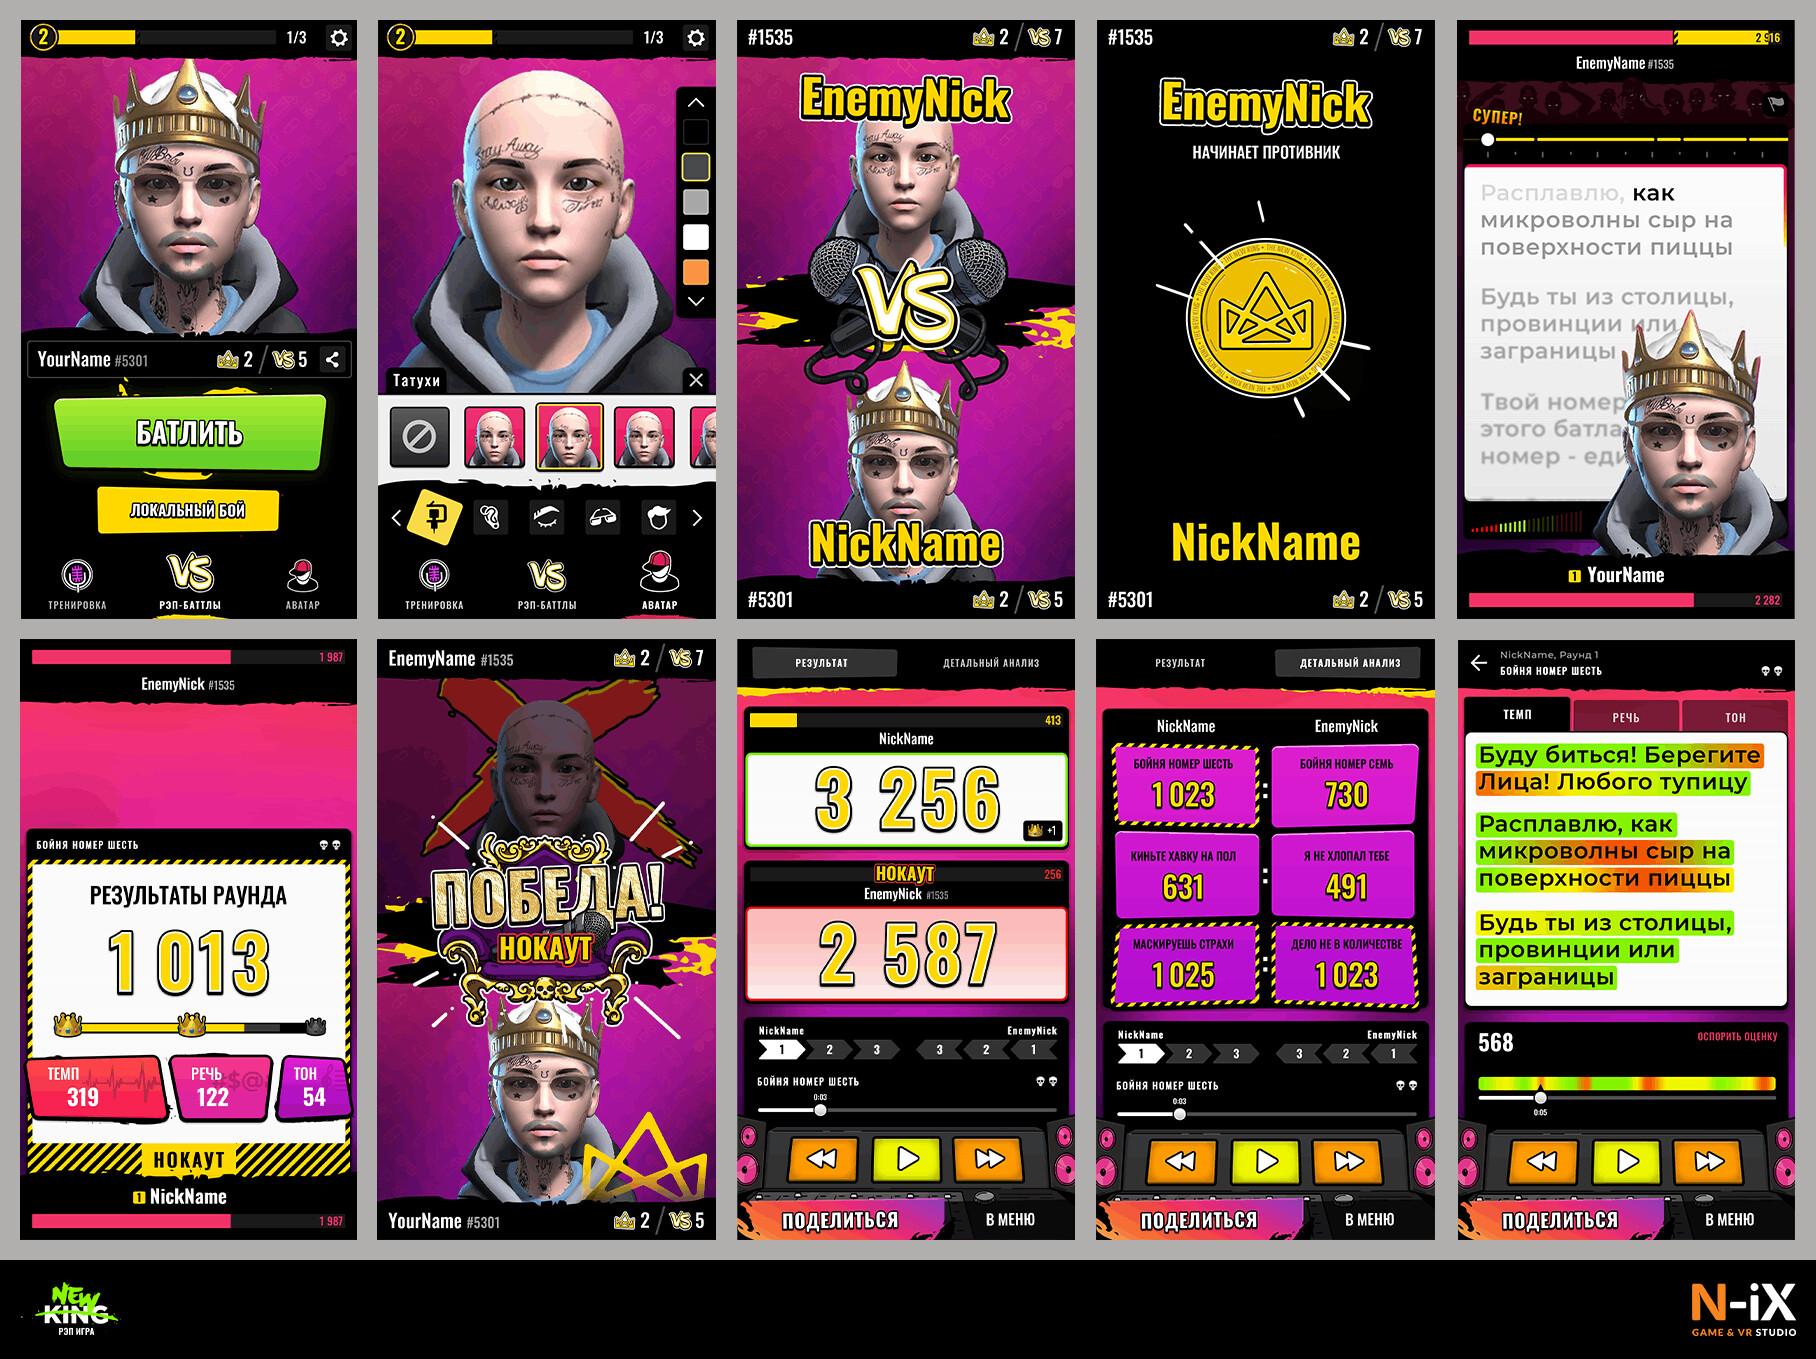 The New King v.3 UI screens